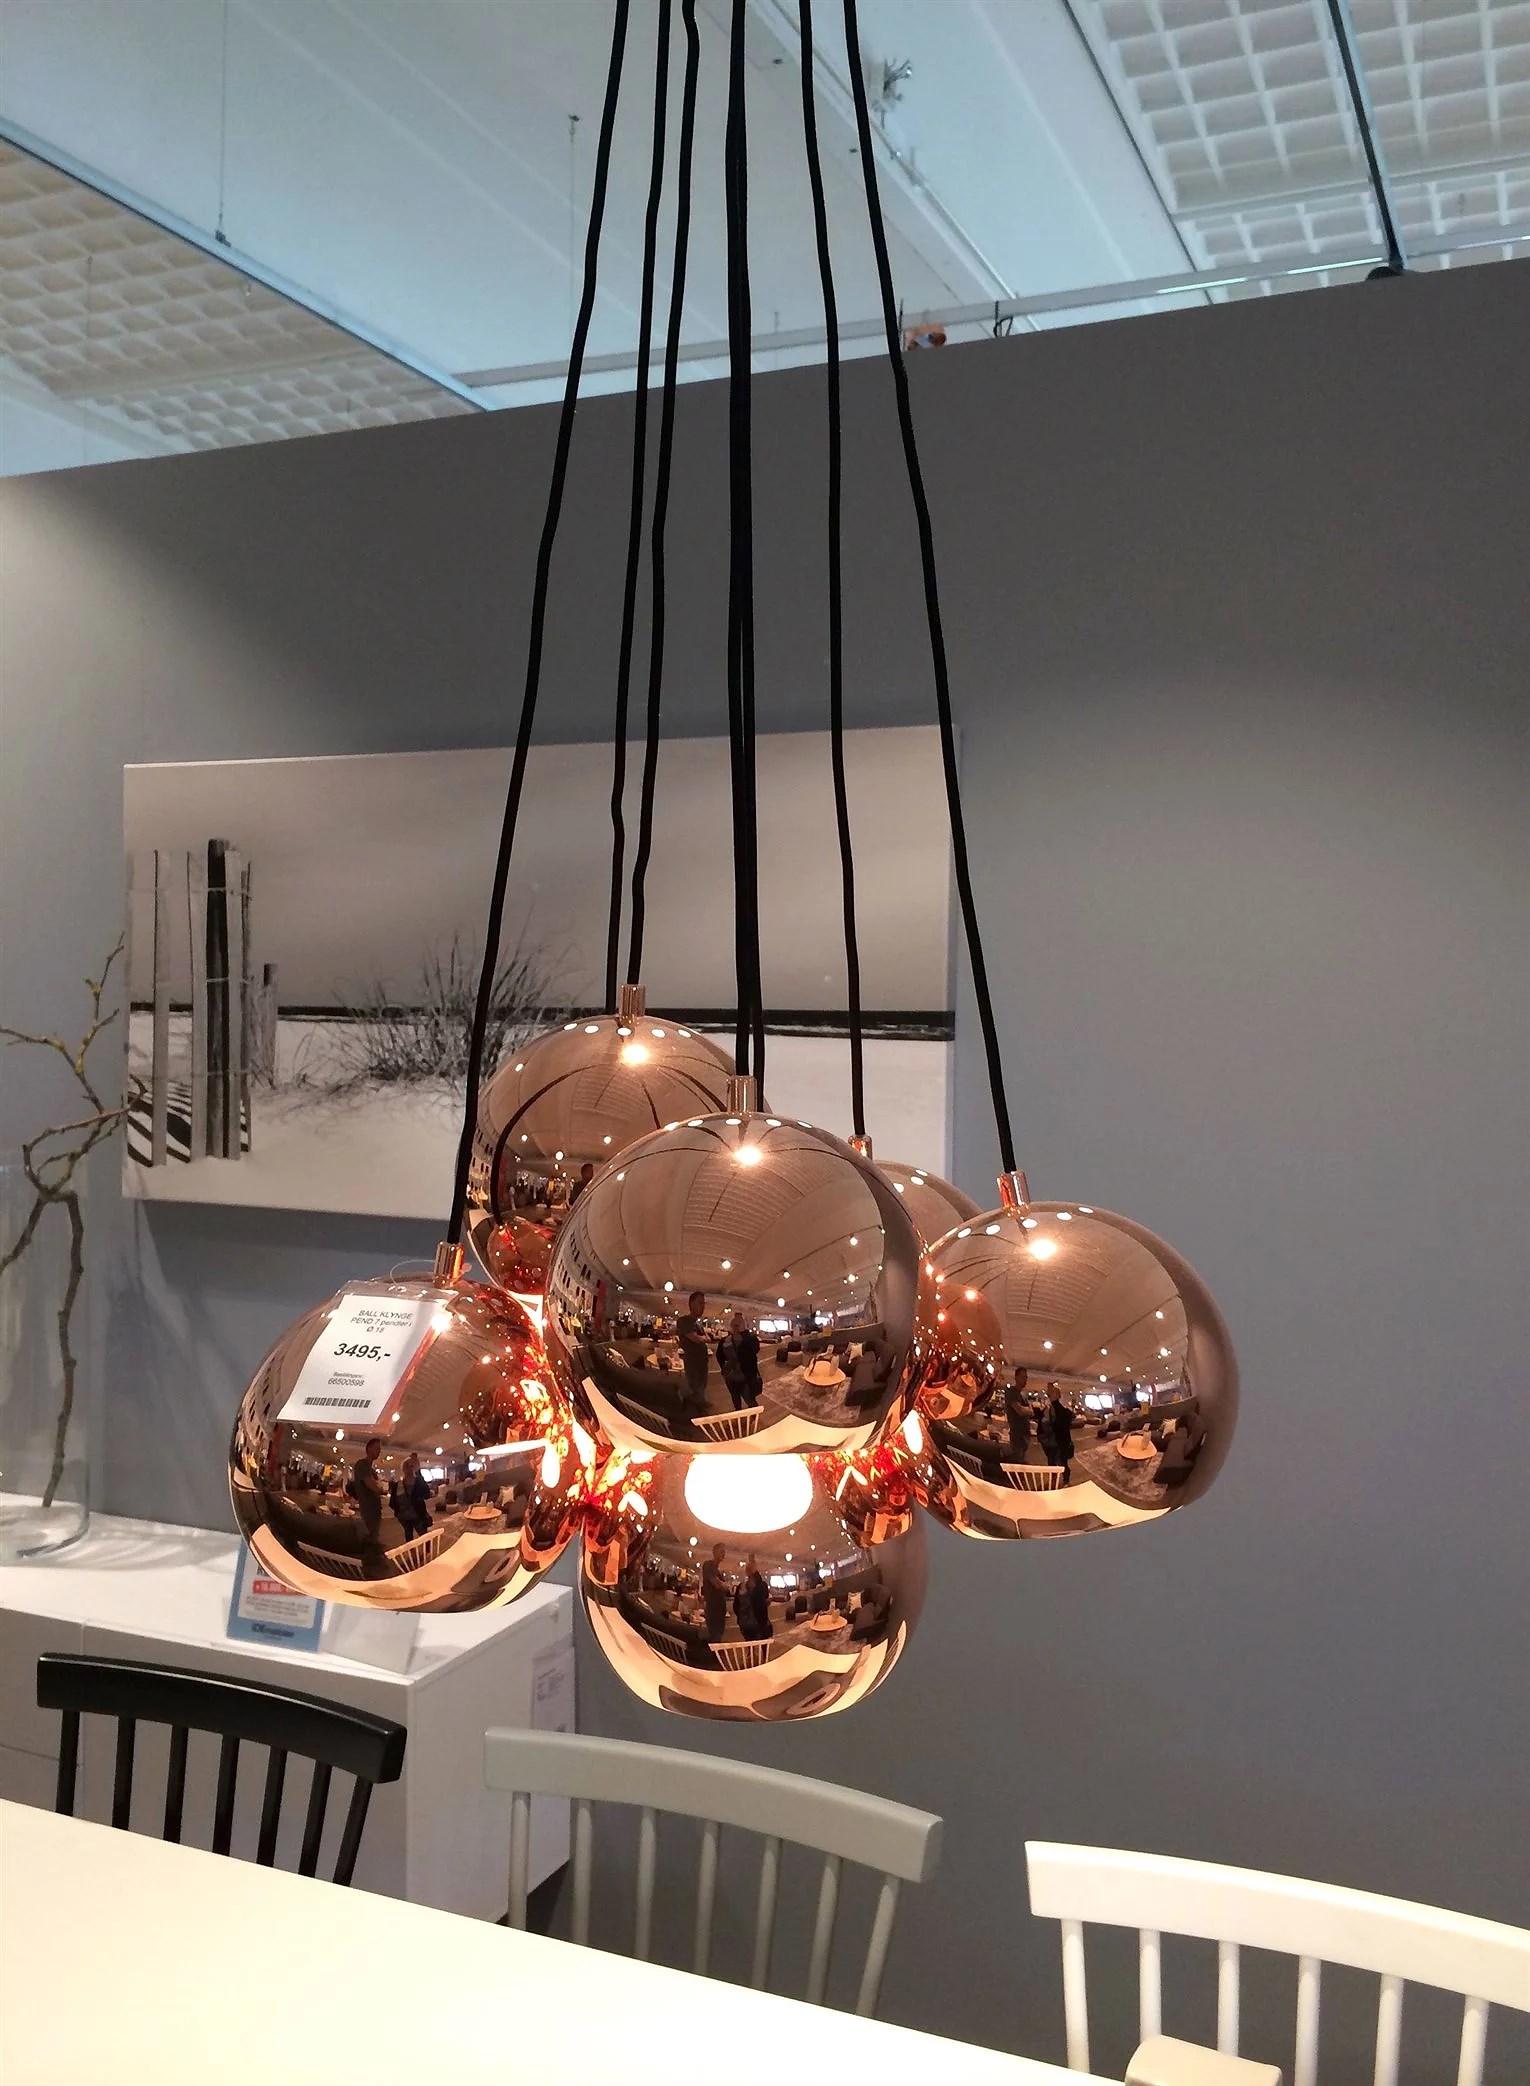 Kobberlamper-itsmpassions